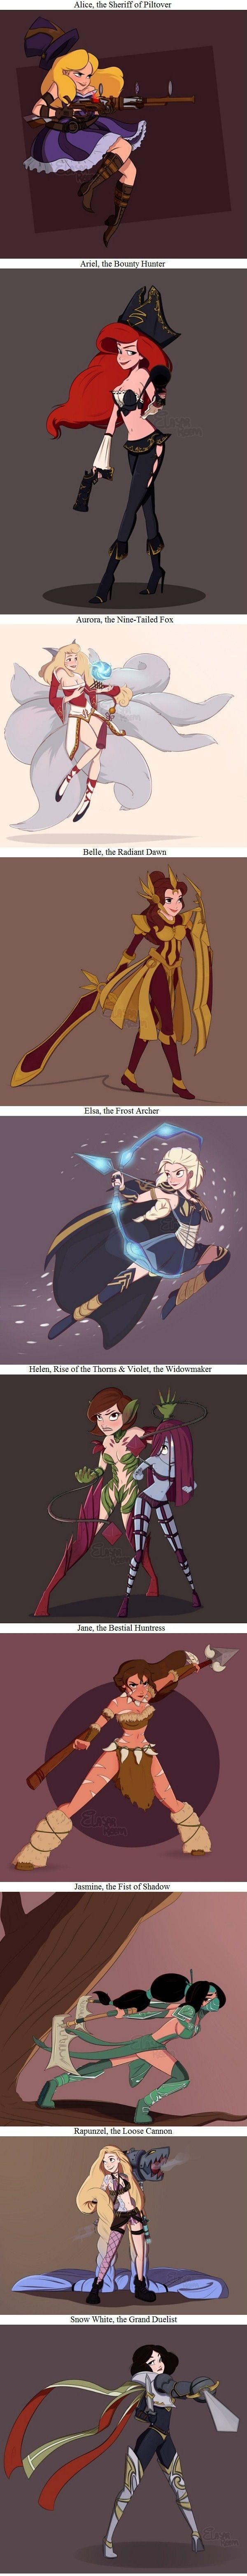 League of (Disney) ladies